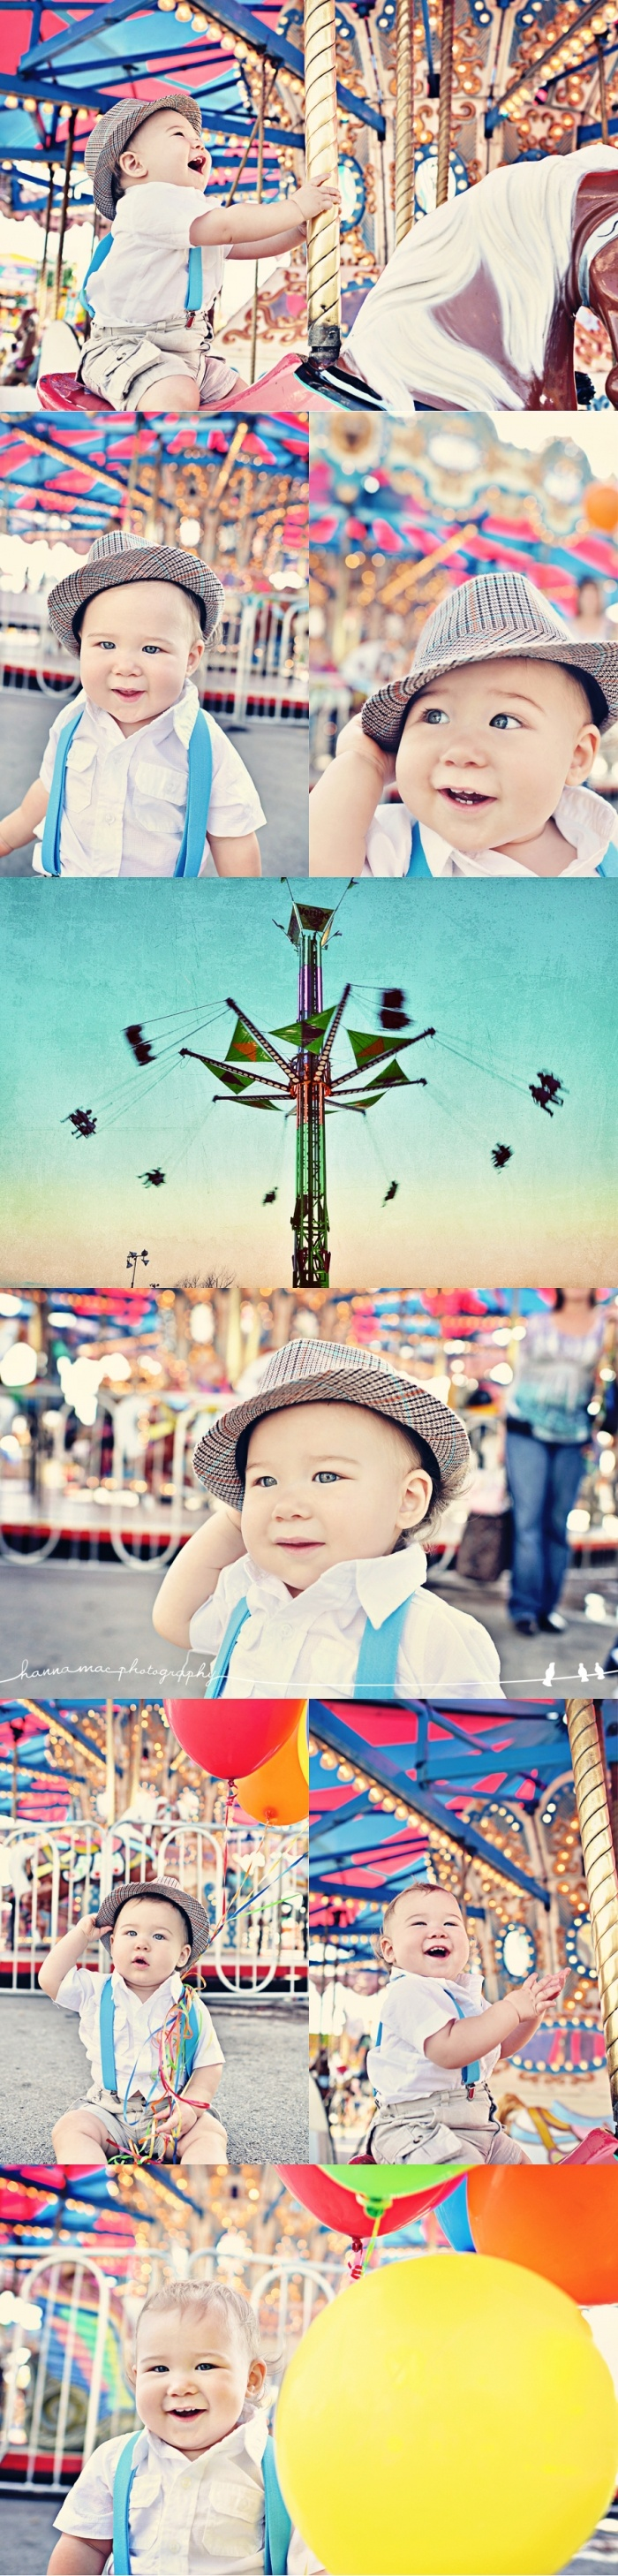 Awesome pics at carnival